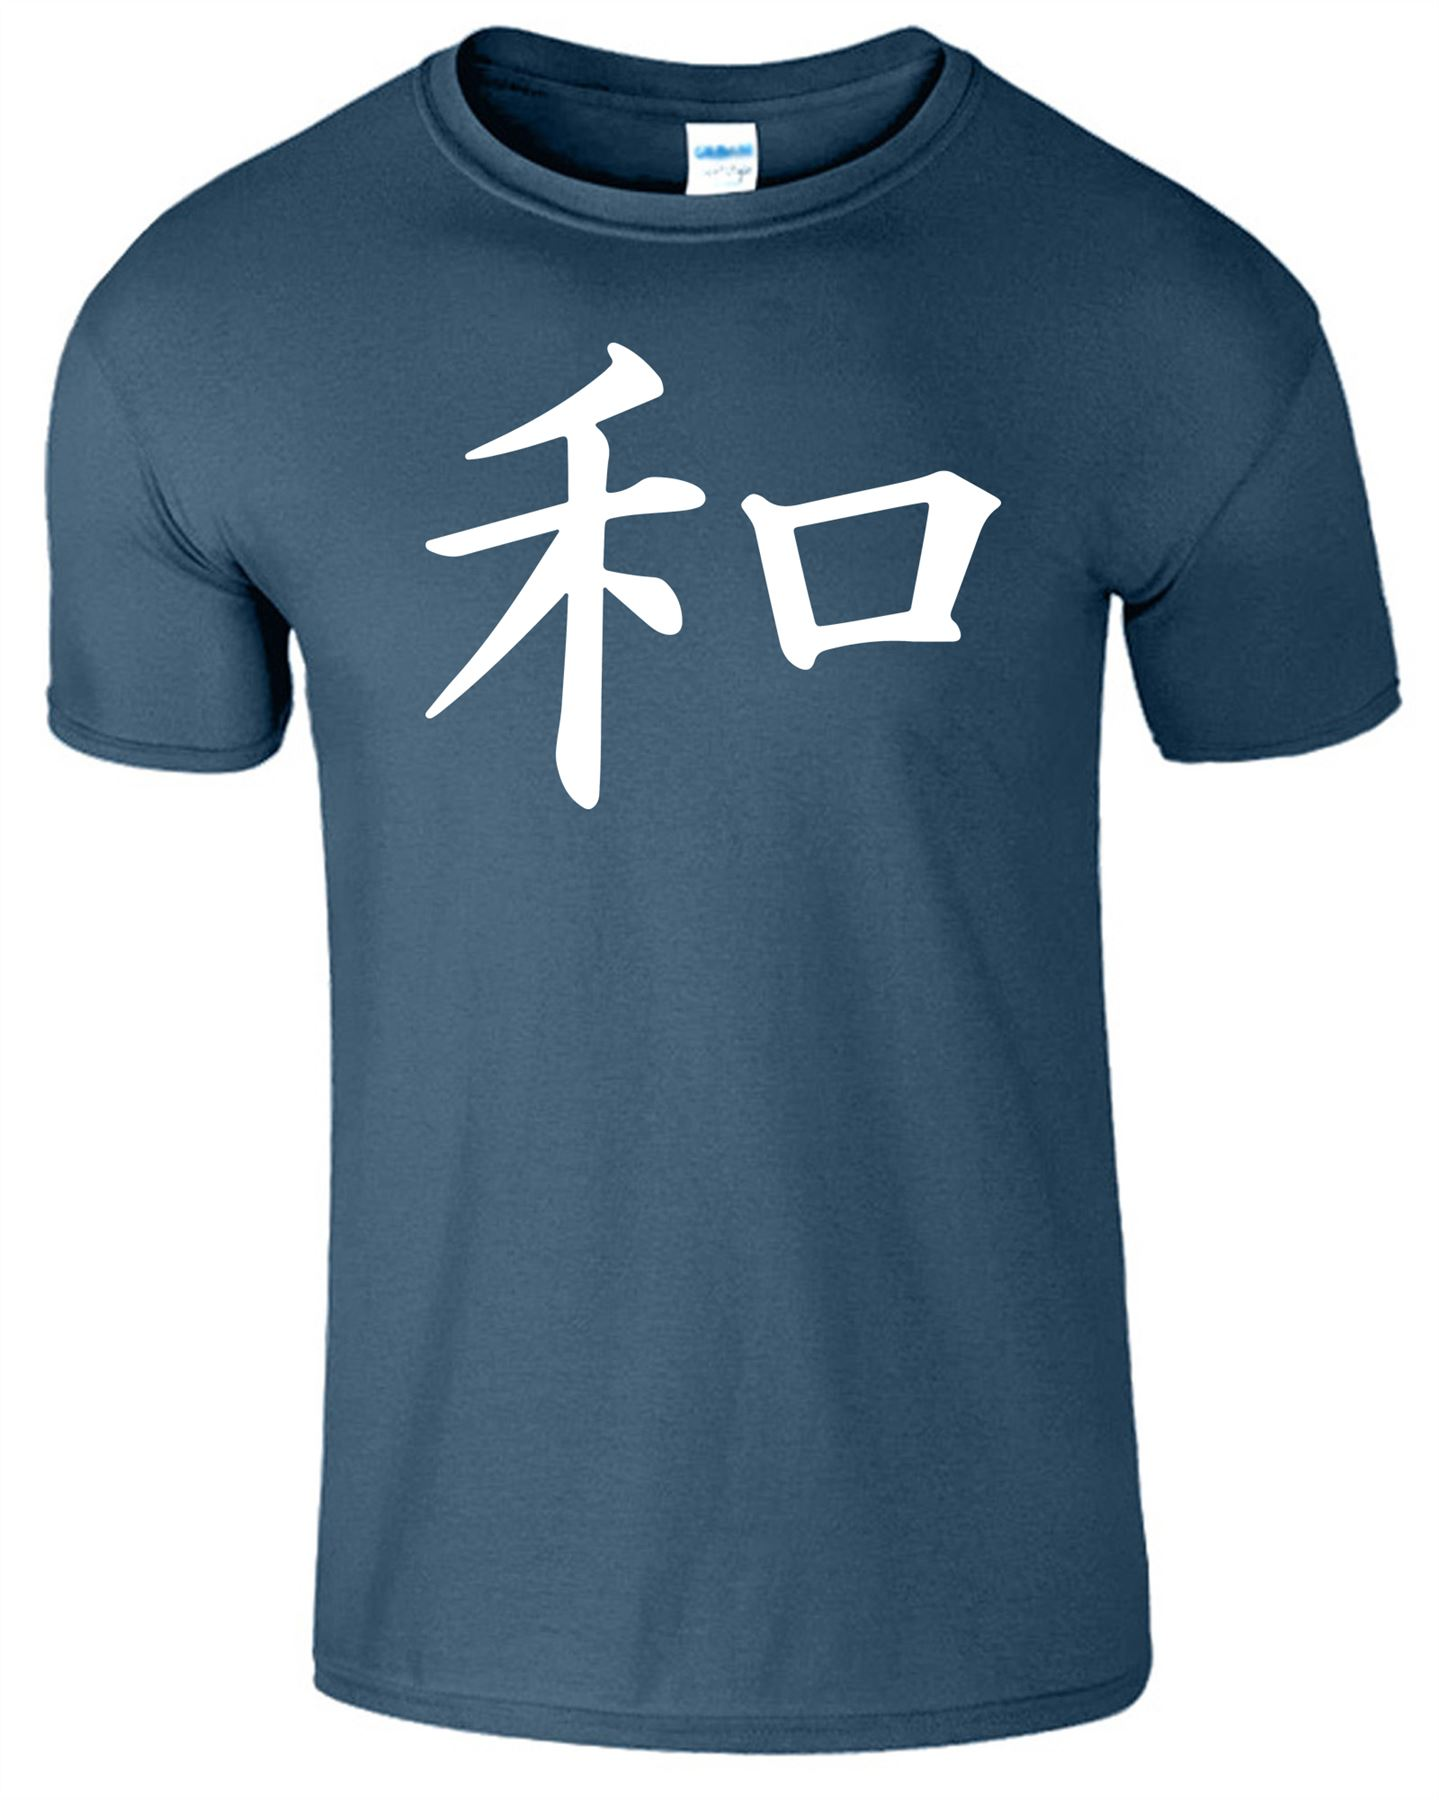 Peace Kids Boys And Girls Japanese Kanji Symbol Graphic Funny Top Tshirt Gift